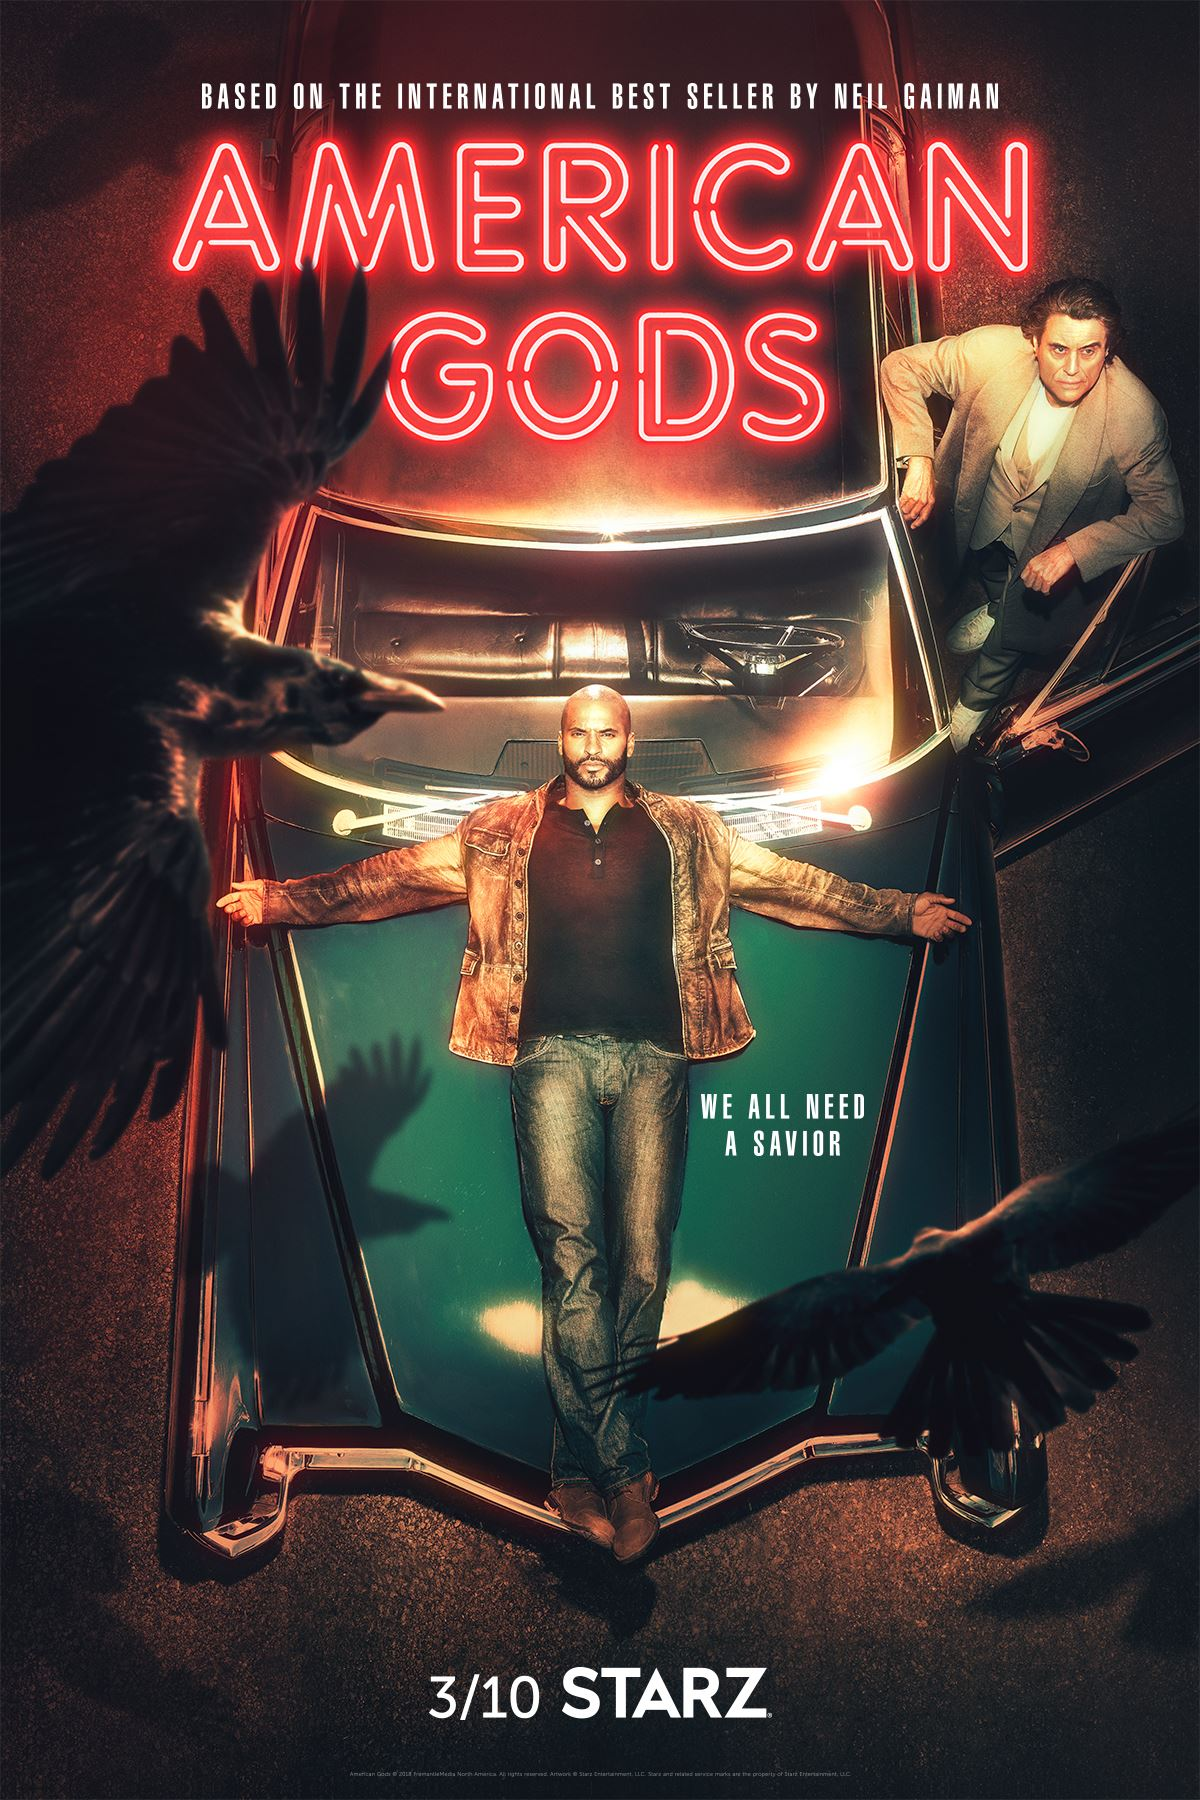 american gods season 2 poster American Gods season 2